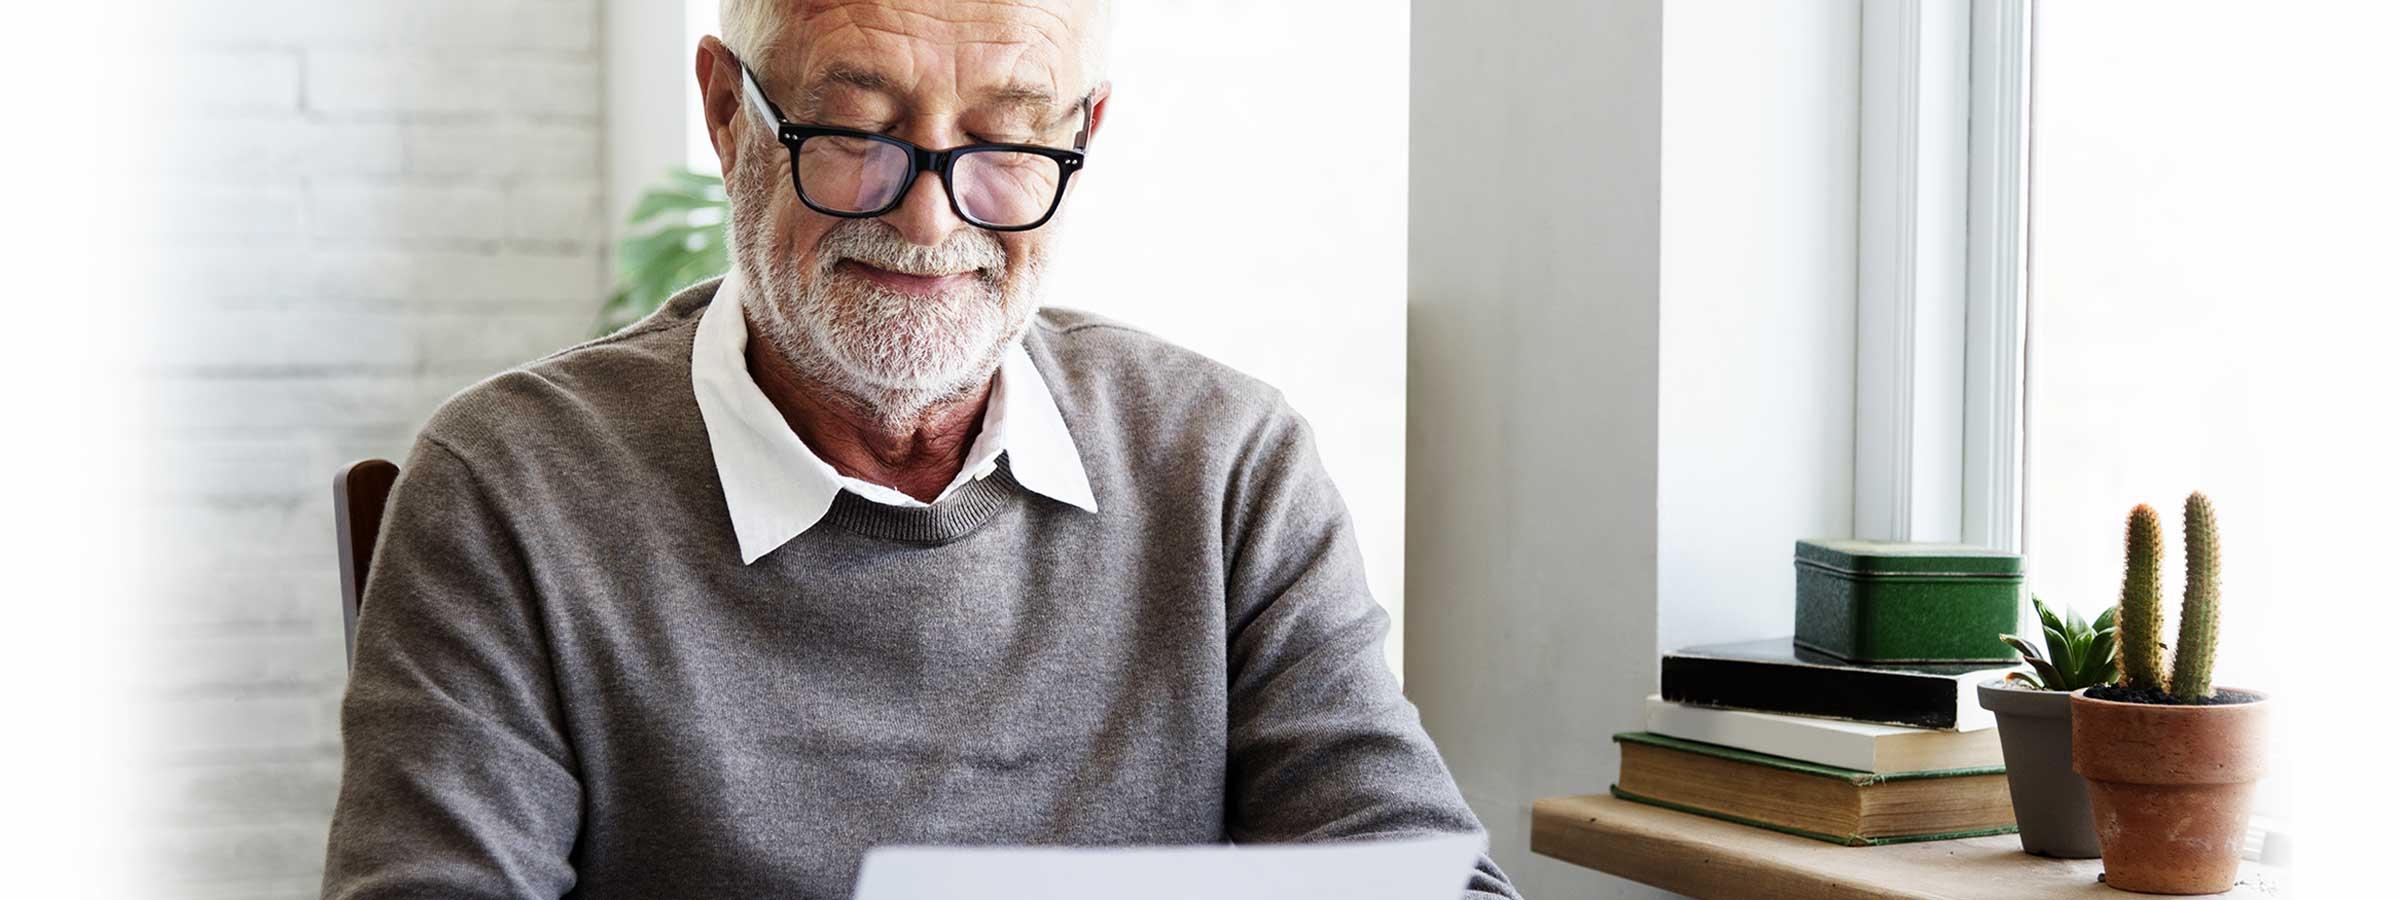 An older man reading through glasses